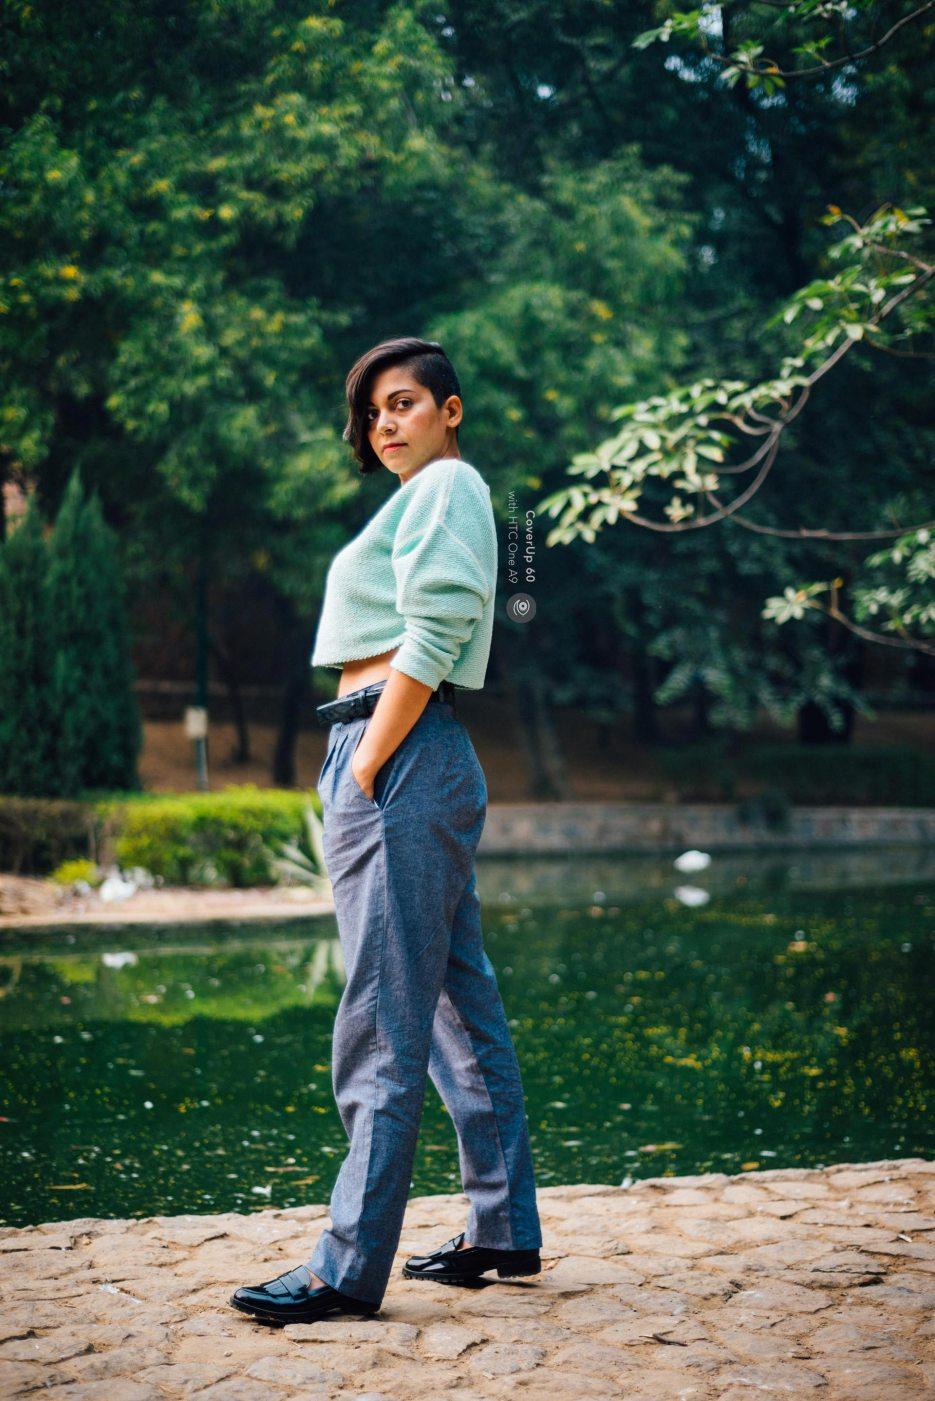 Naina.co-Luxury-Lifestyle-Photographer-Nov-2015-HTCOneA9-PursuitOfBrilliance-CoverUp-60